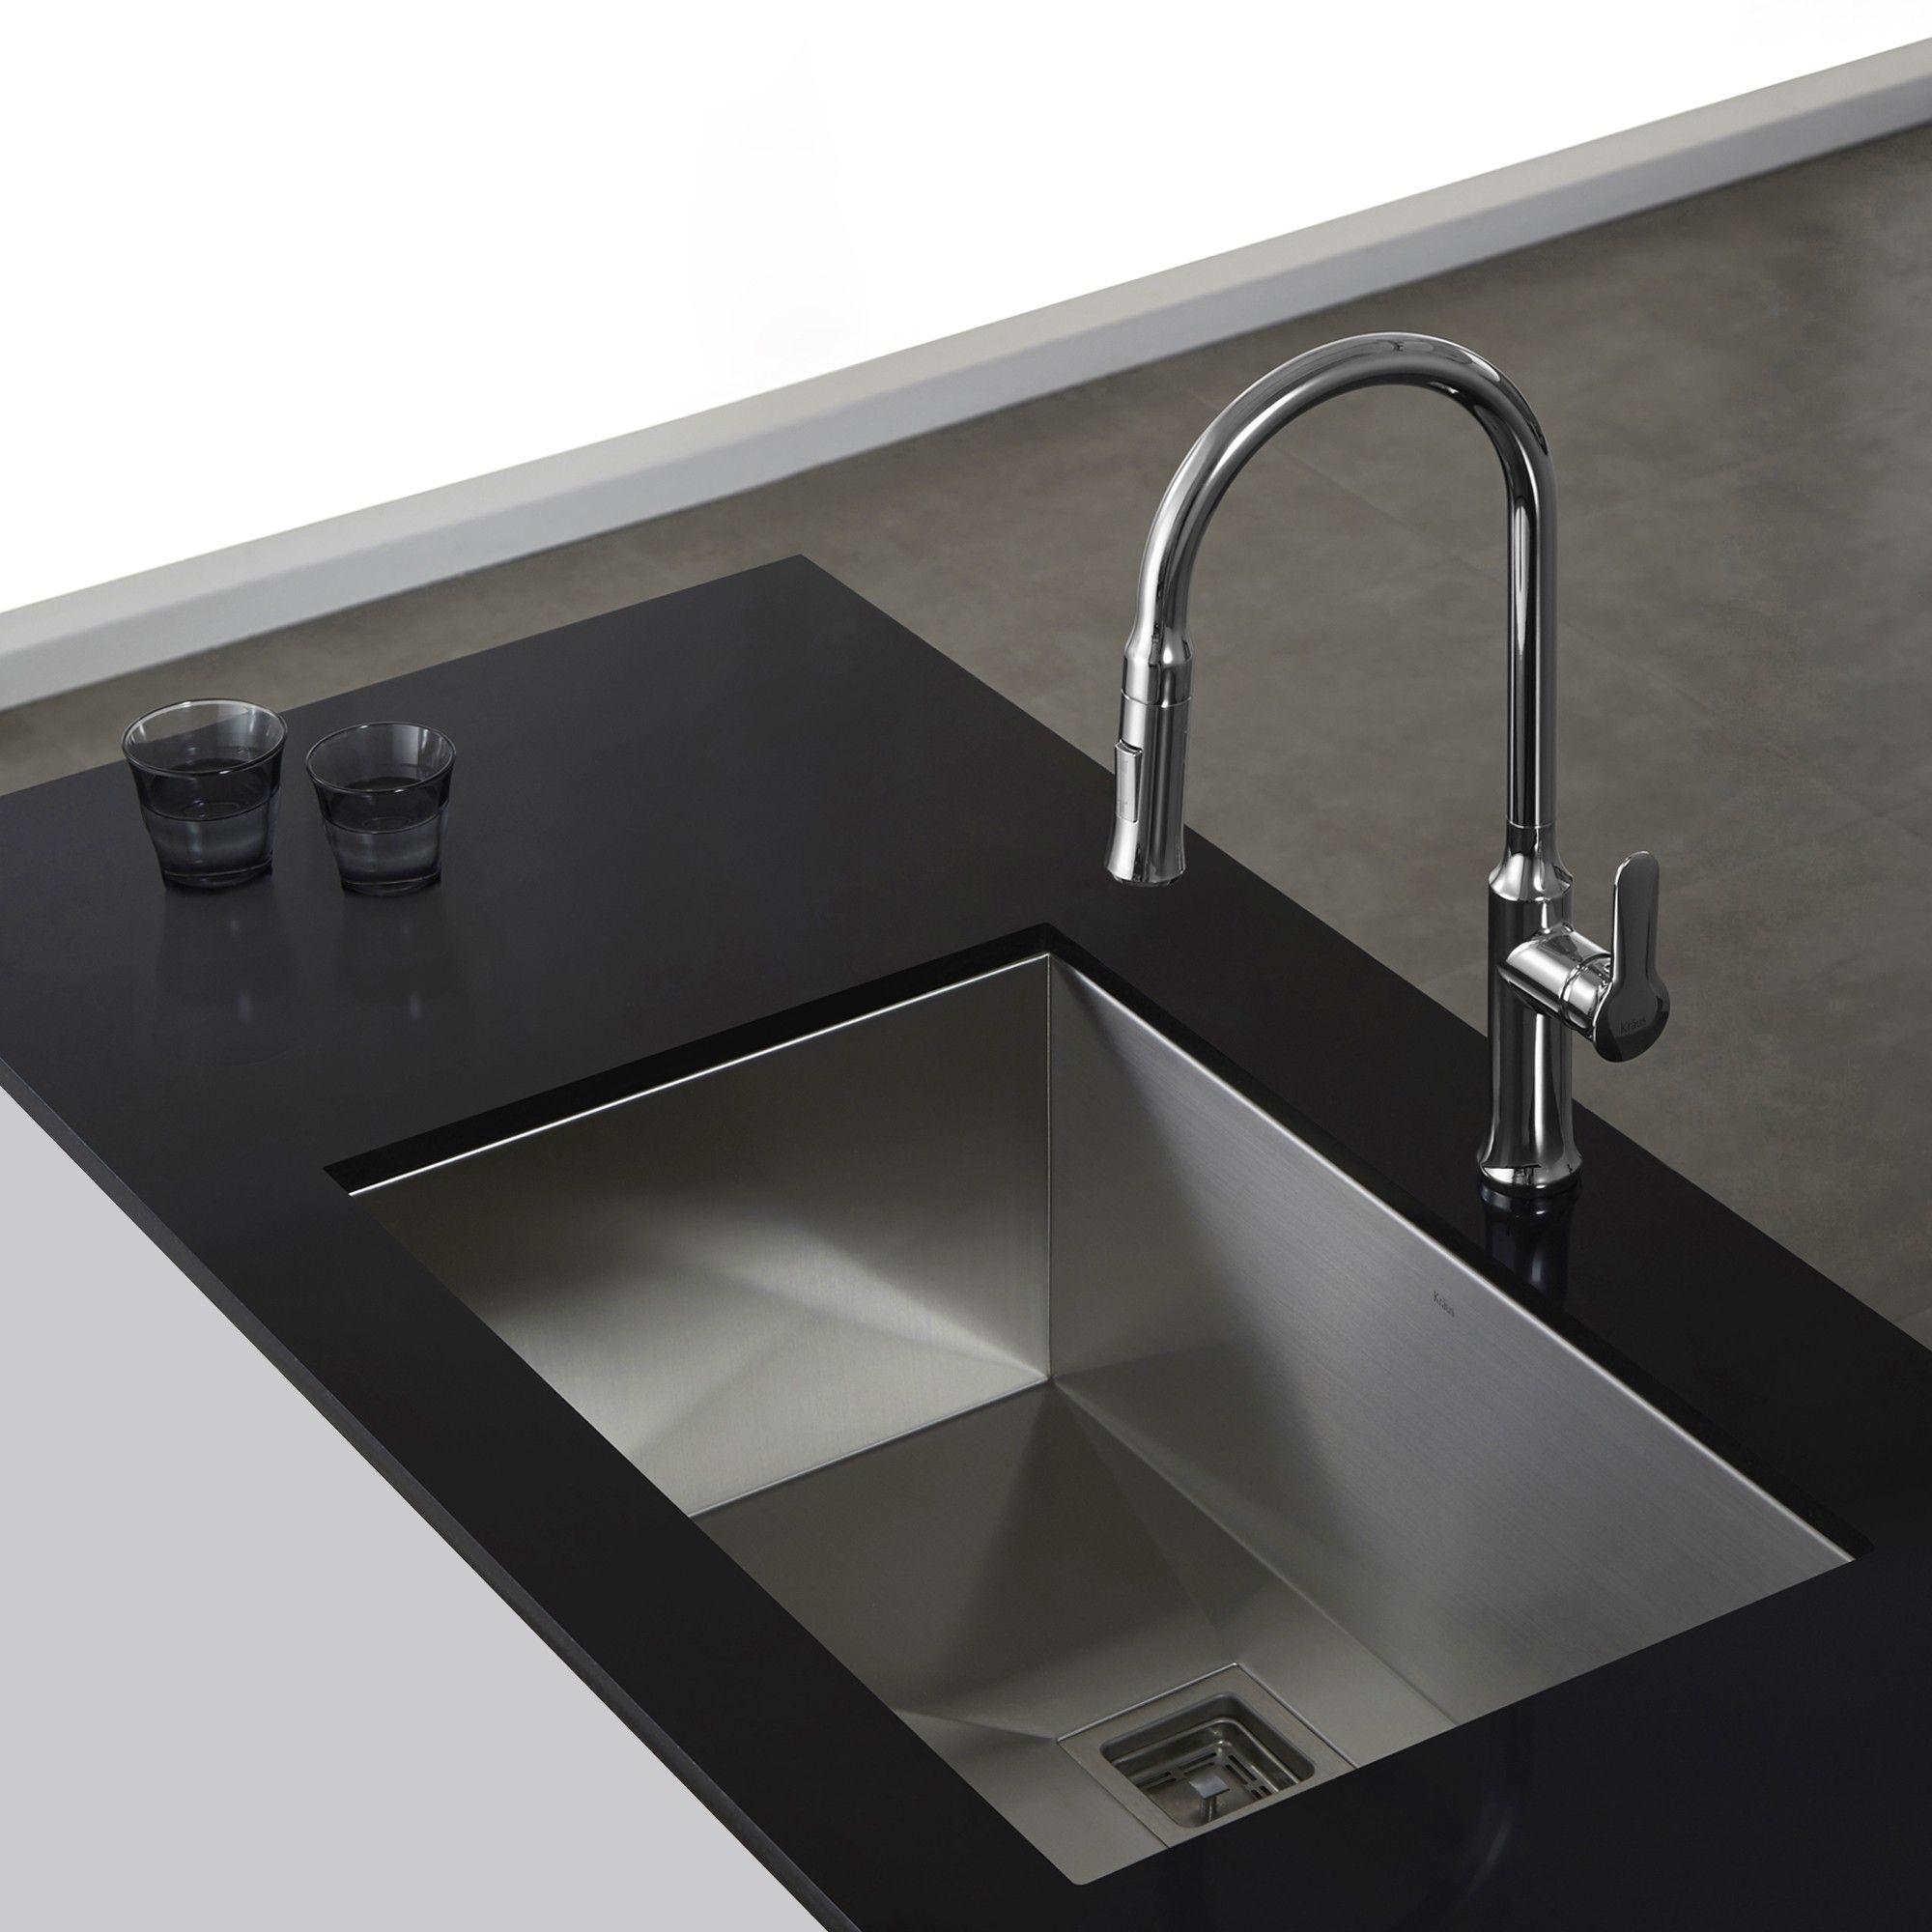 The Pax™ Zero-Radius 28 1/2 Inch Kitchen Sink has a clean, geometric ...